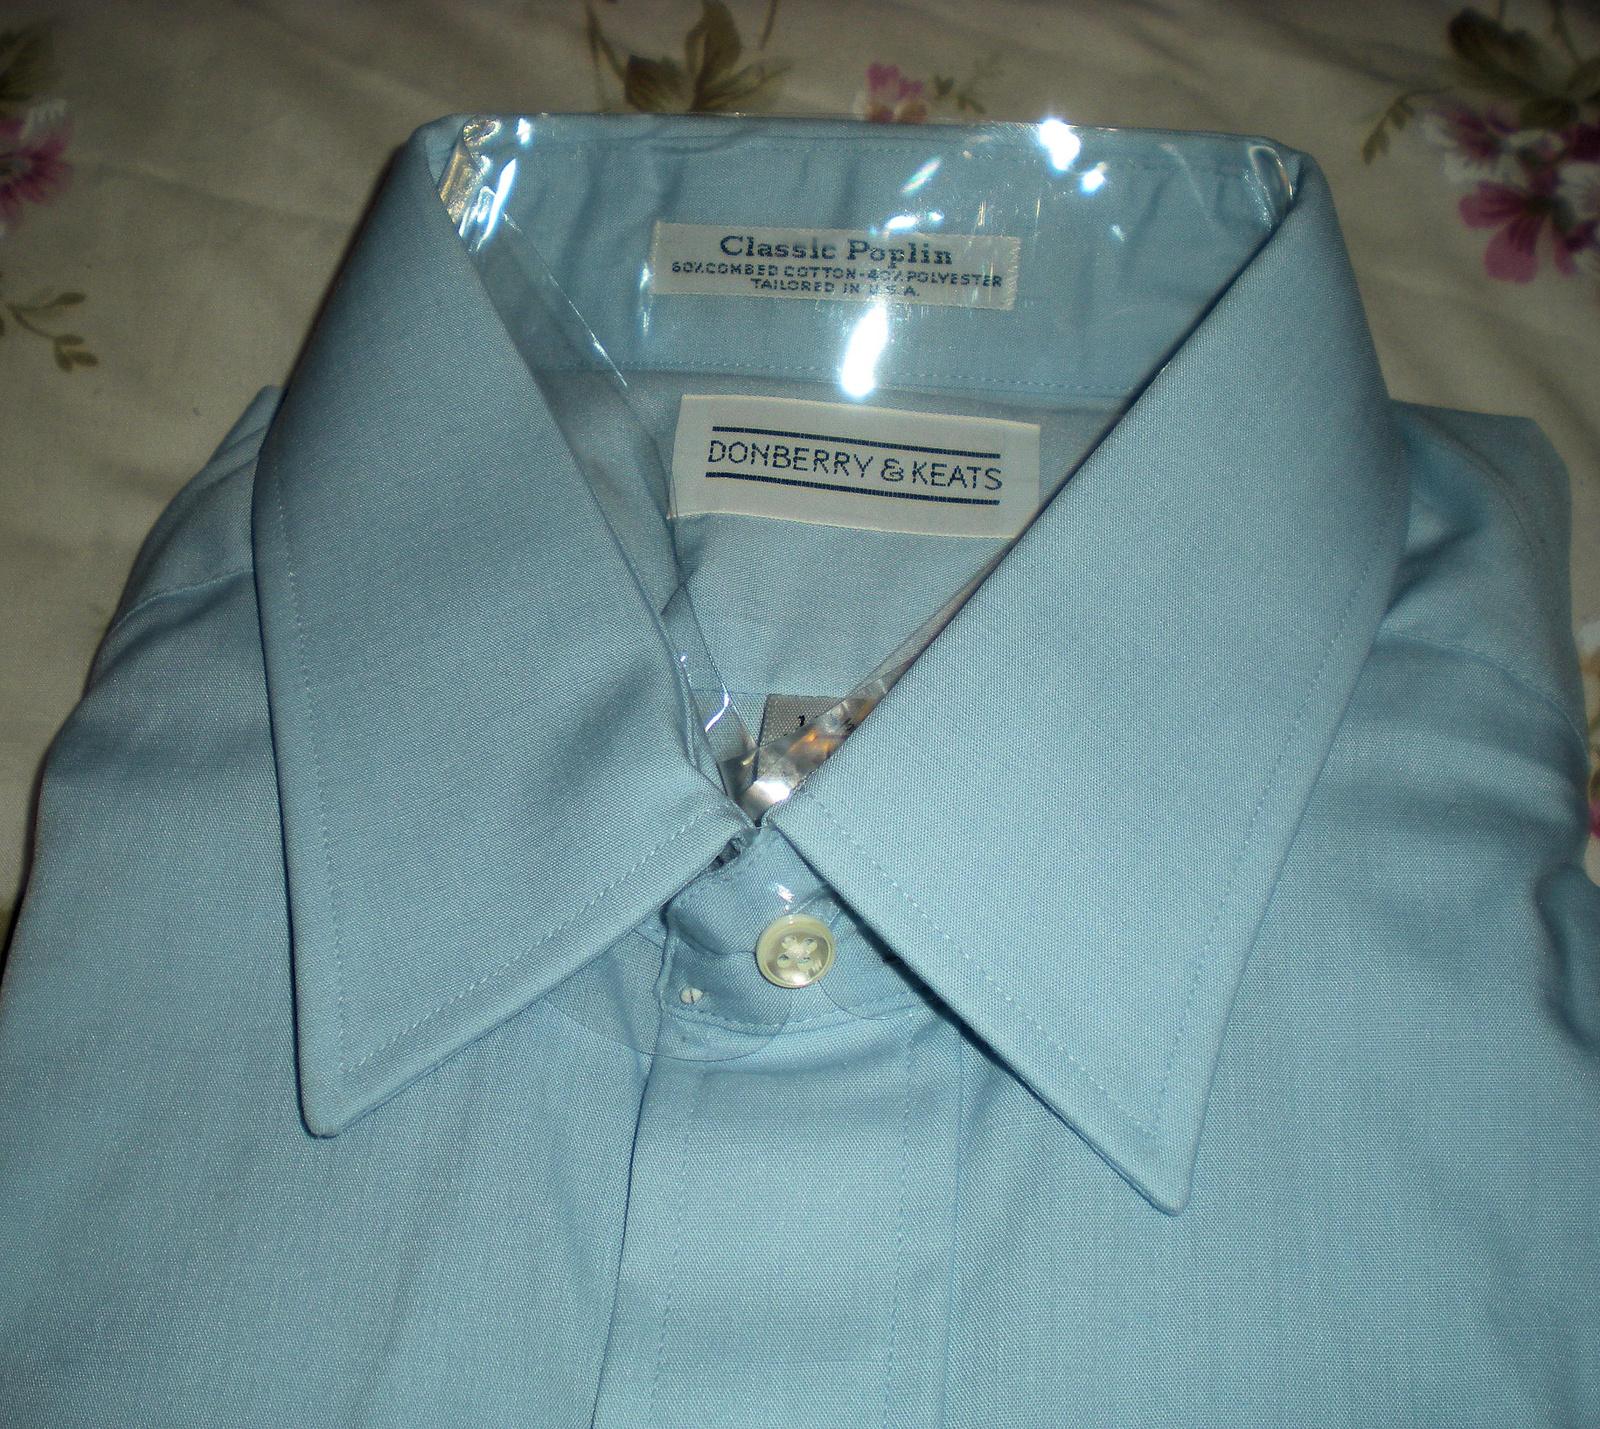 Men's Dress Shirt-Short Sleeve  By Donberry & Keats -Color Ligh Blue  (15.5)